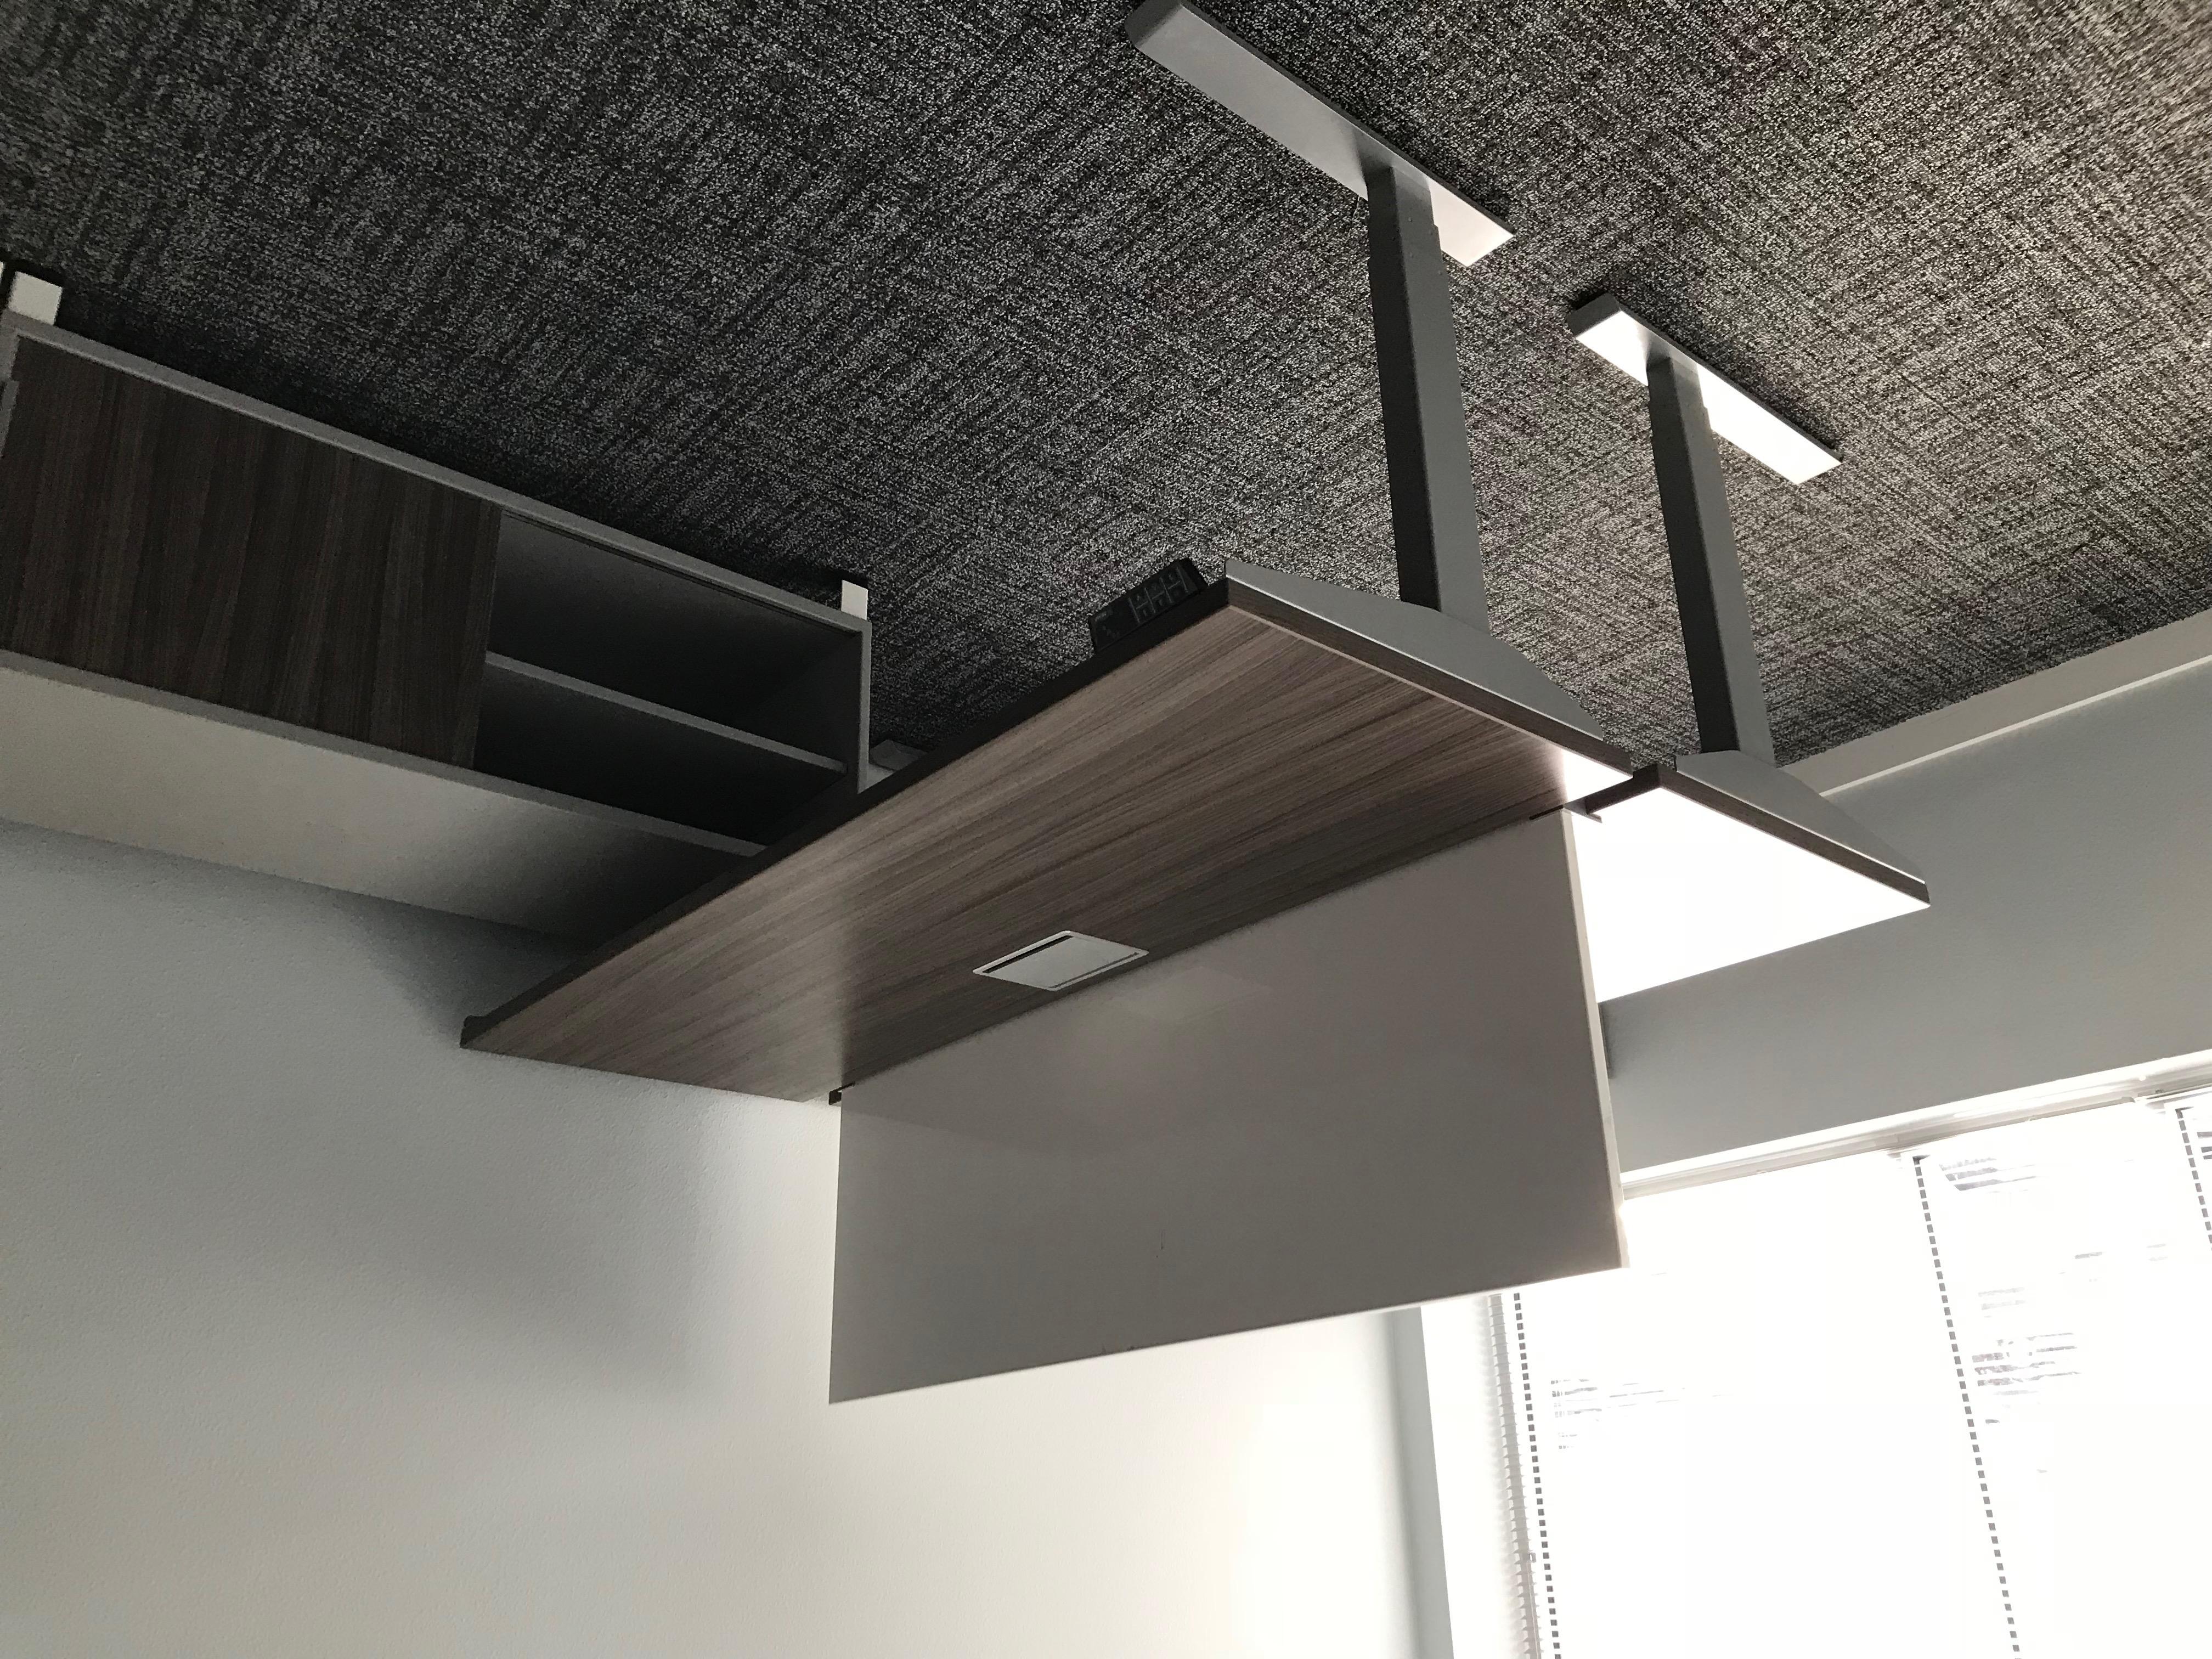 manasota-office-supplies-llc-adjustable-tables-in-bradenton-florida-manasota-office-supplies-llc-11-.jpg